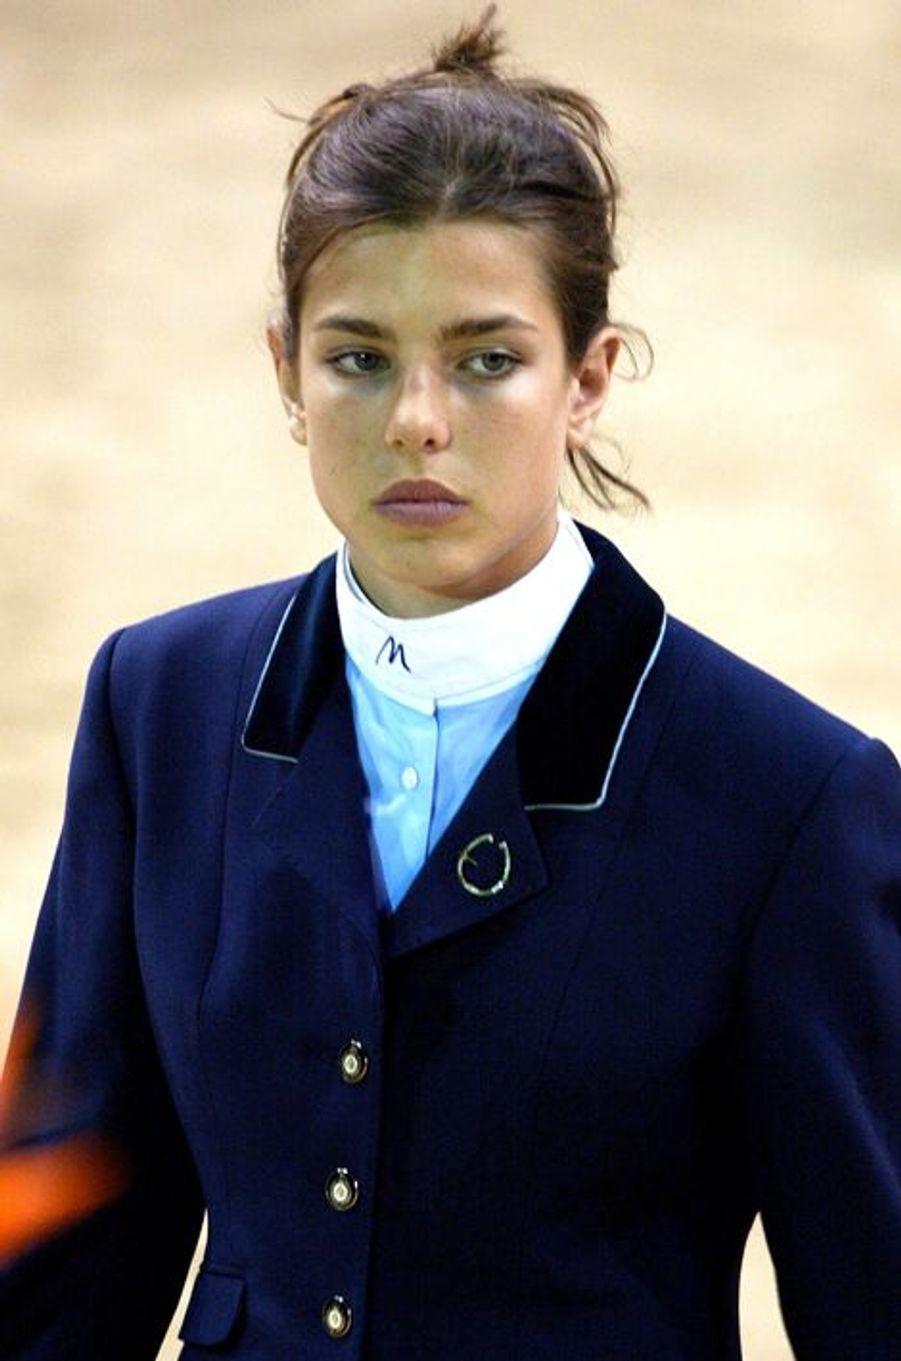 Charlotte Casiraghi le 25 avril 2002